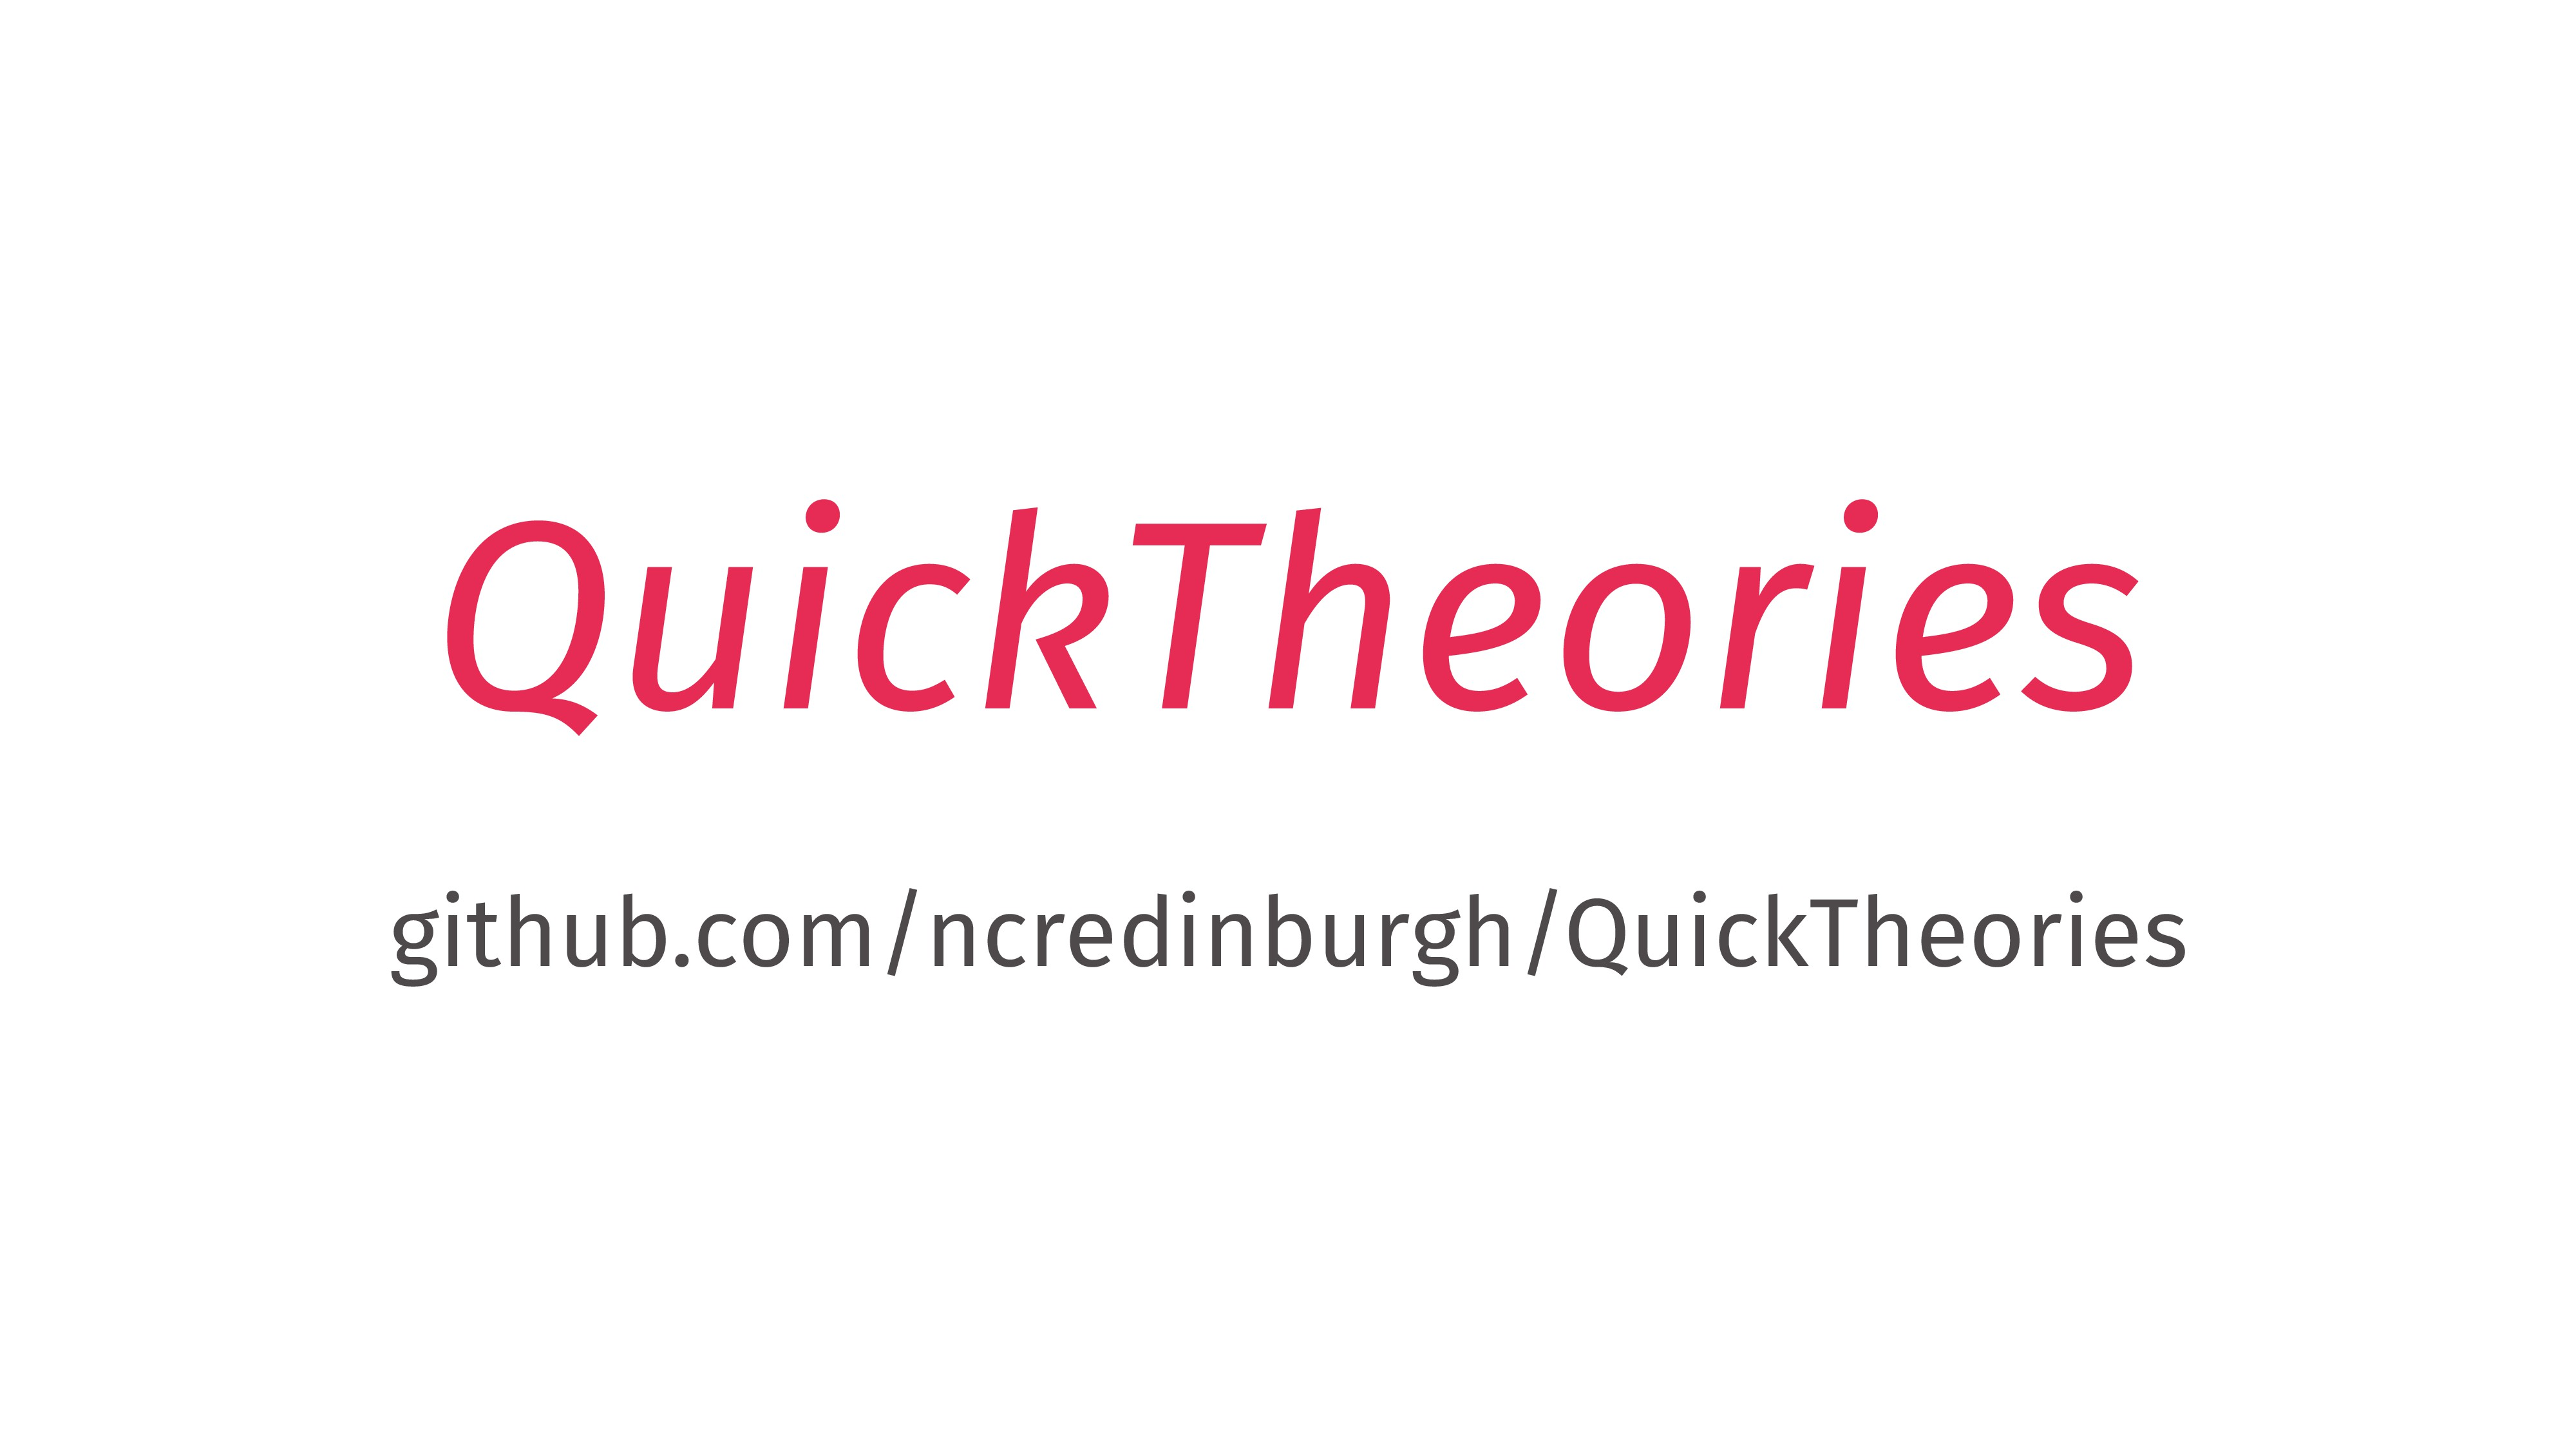 QuickTheories github.com/ncredinburgh/QuickTheo...